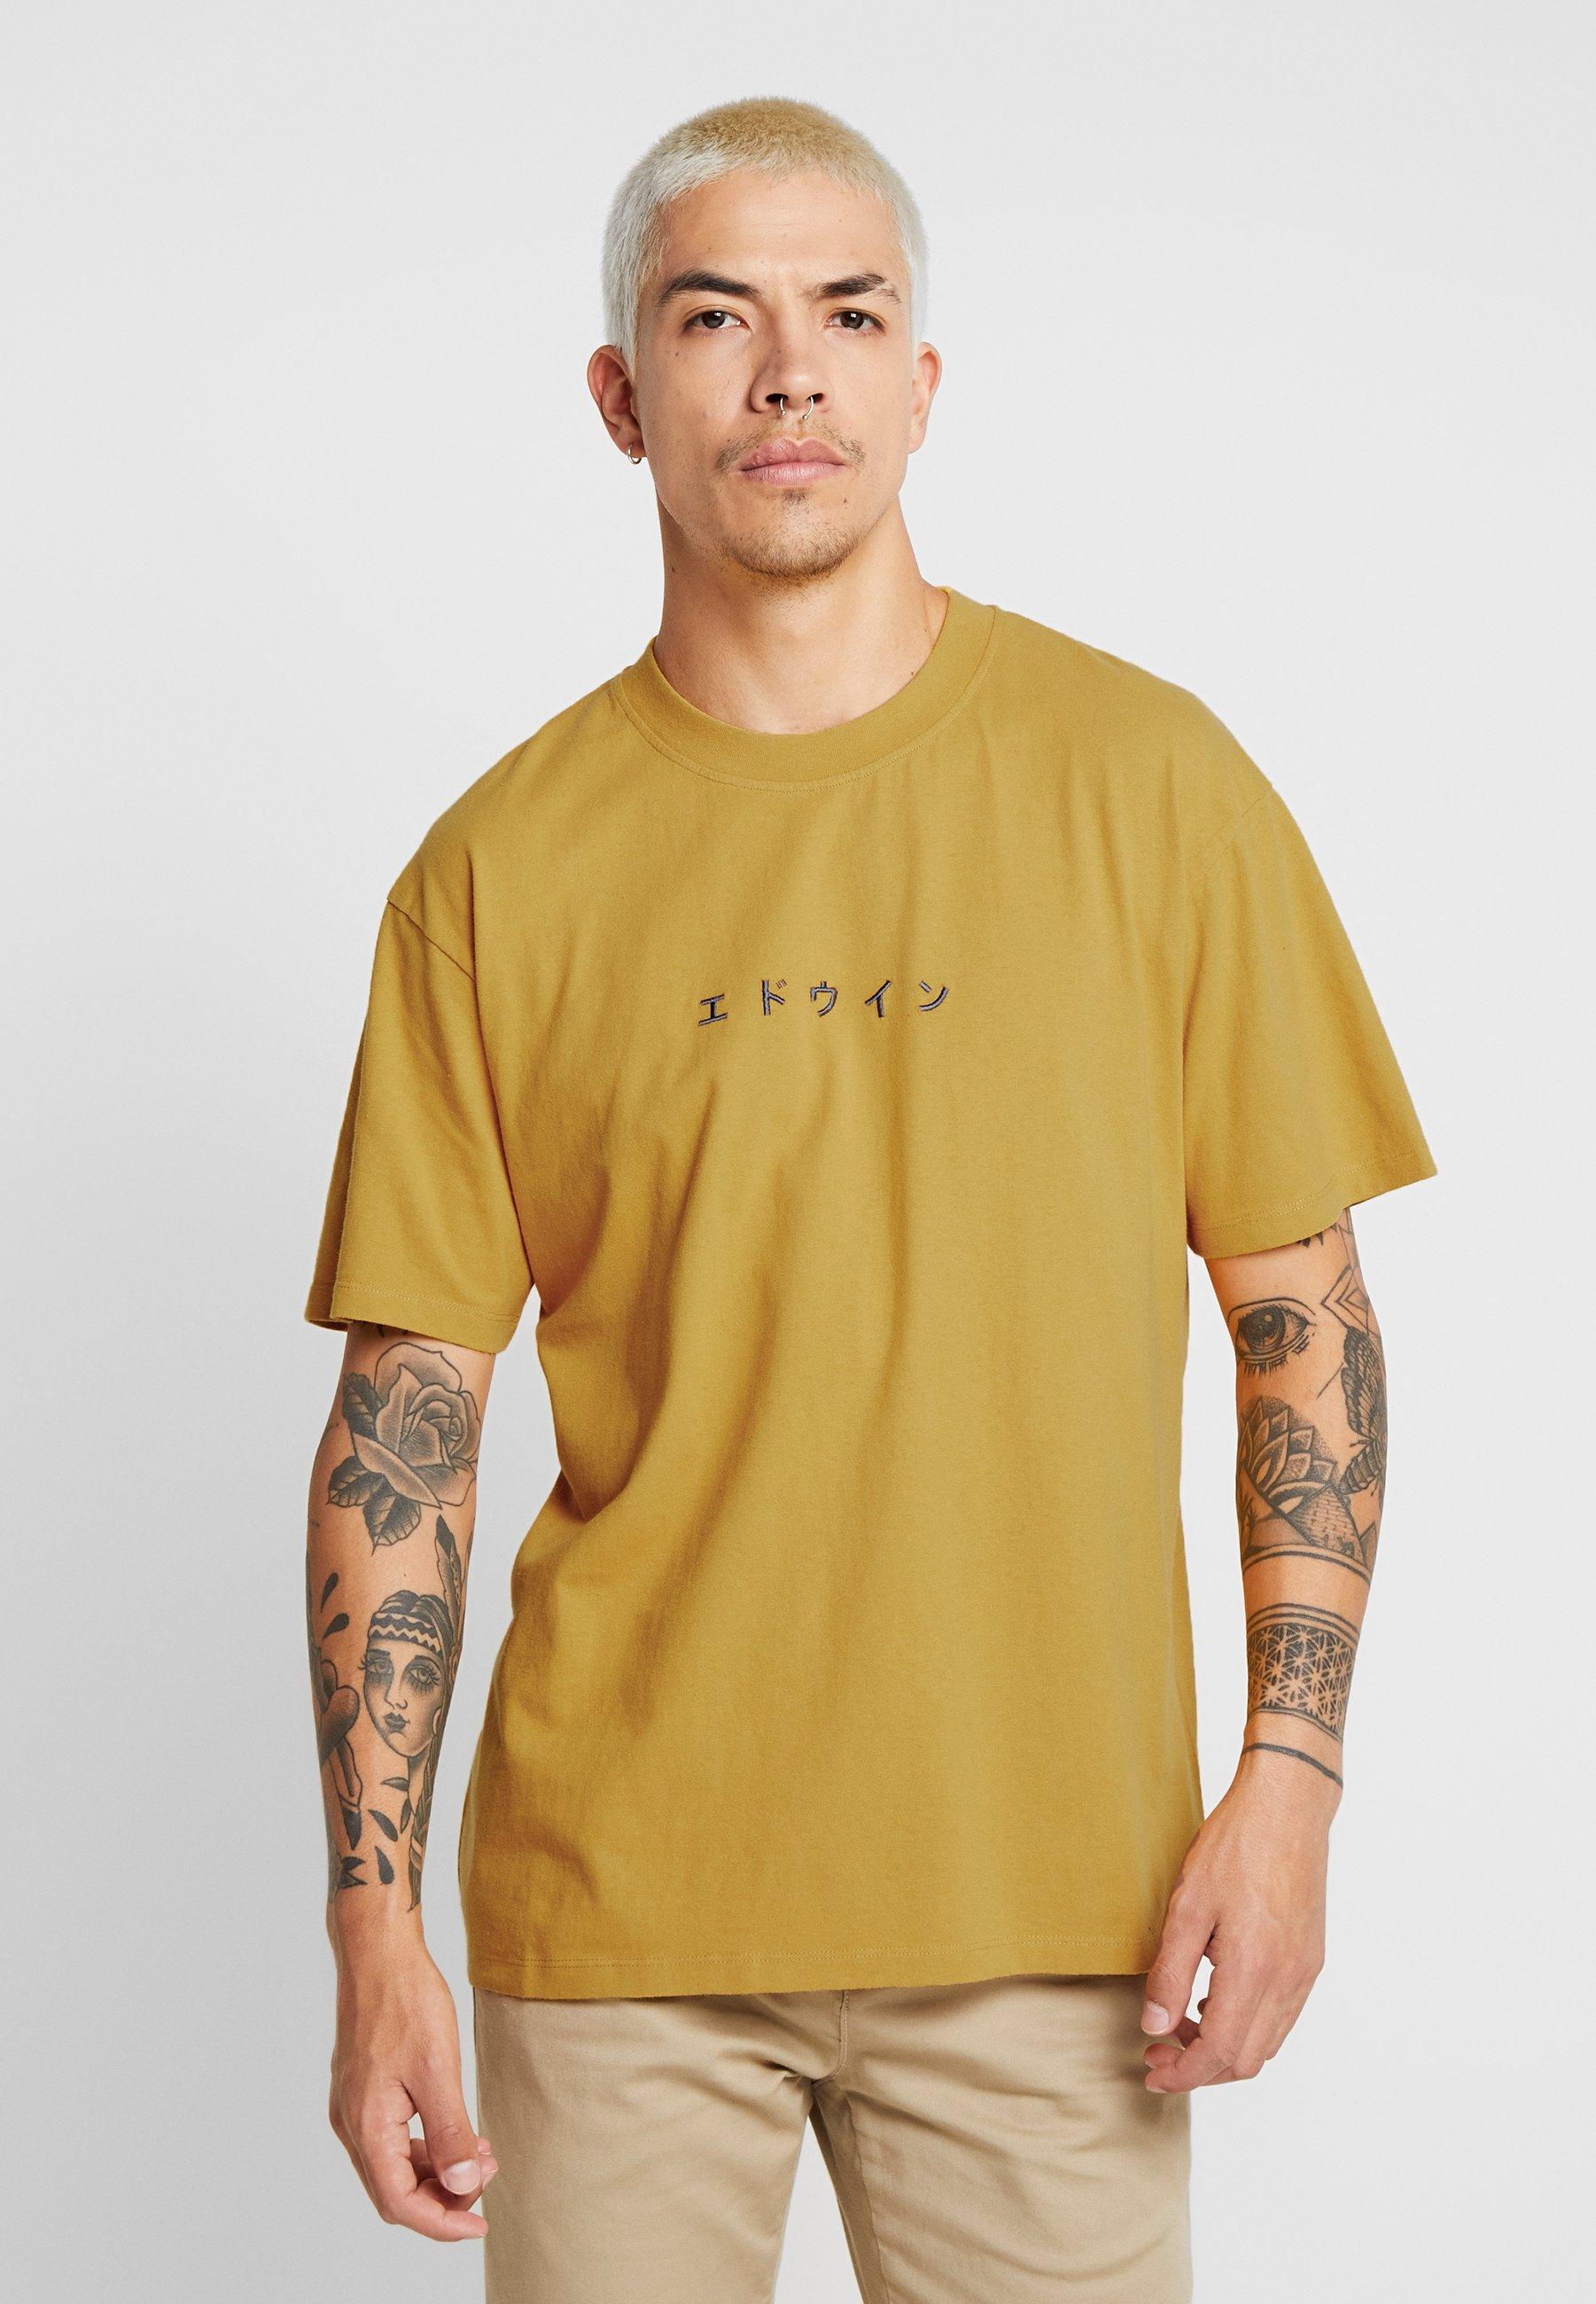 Imprimé Edwin shirt Gold Harvest KatakanaT OkXlTwPZiu